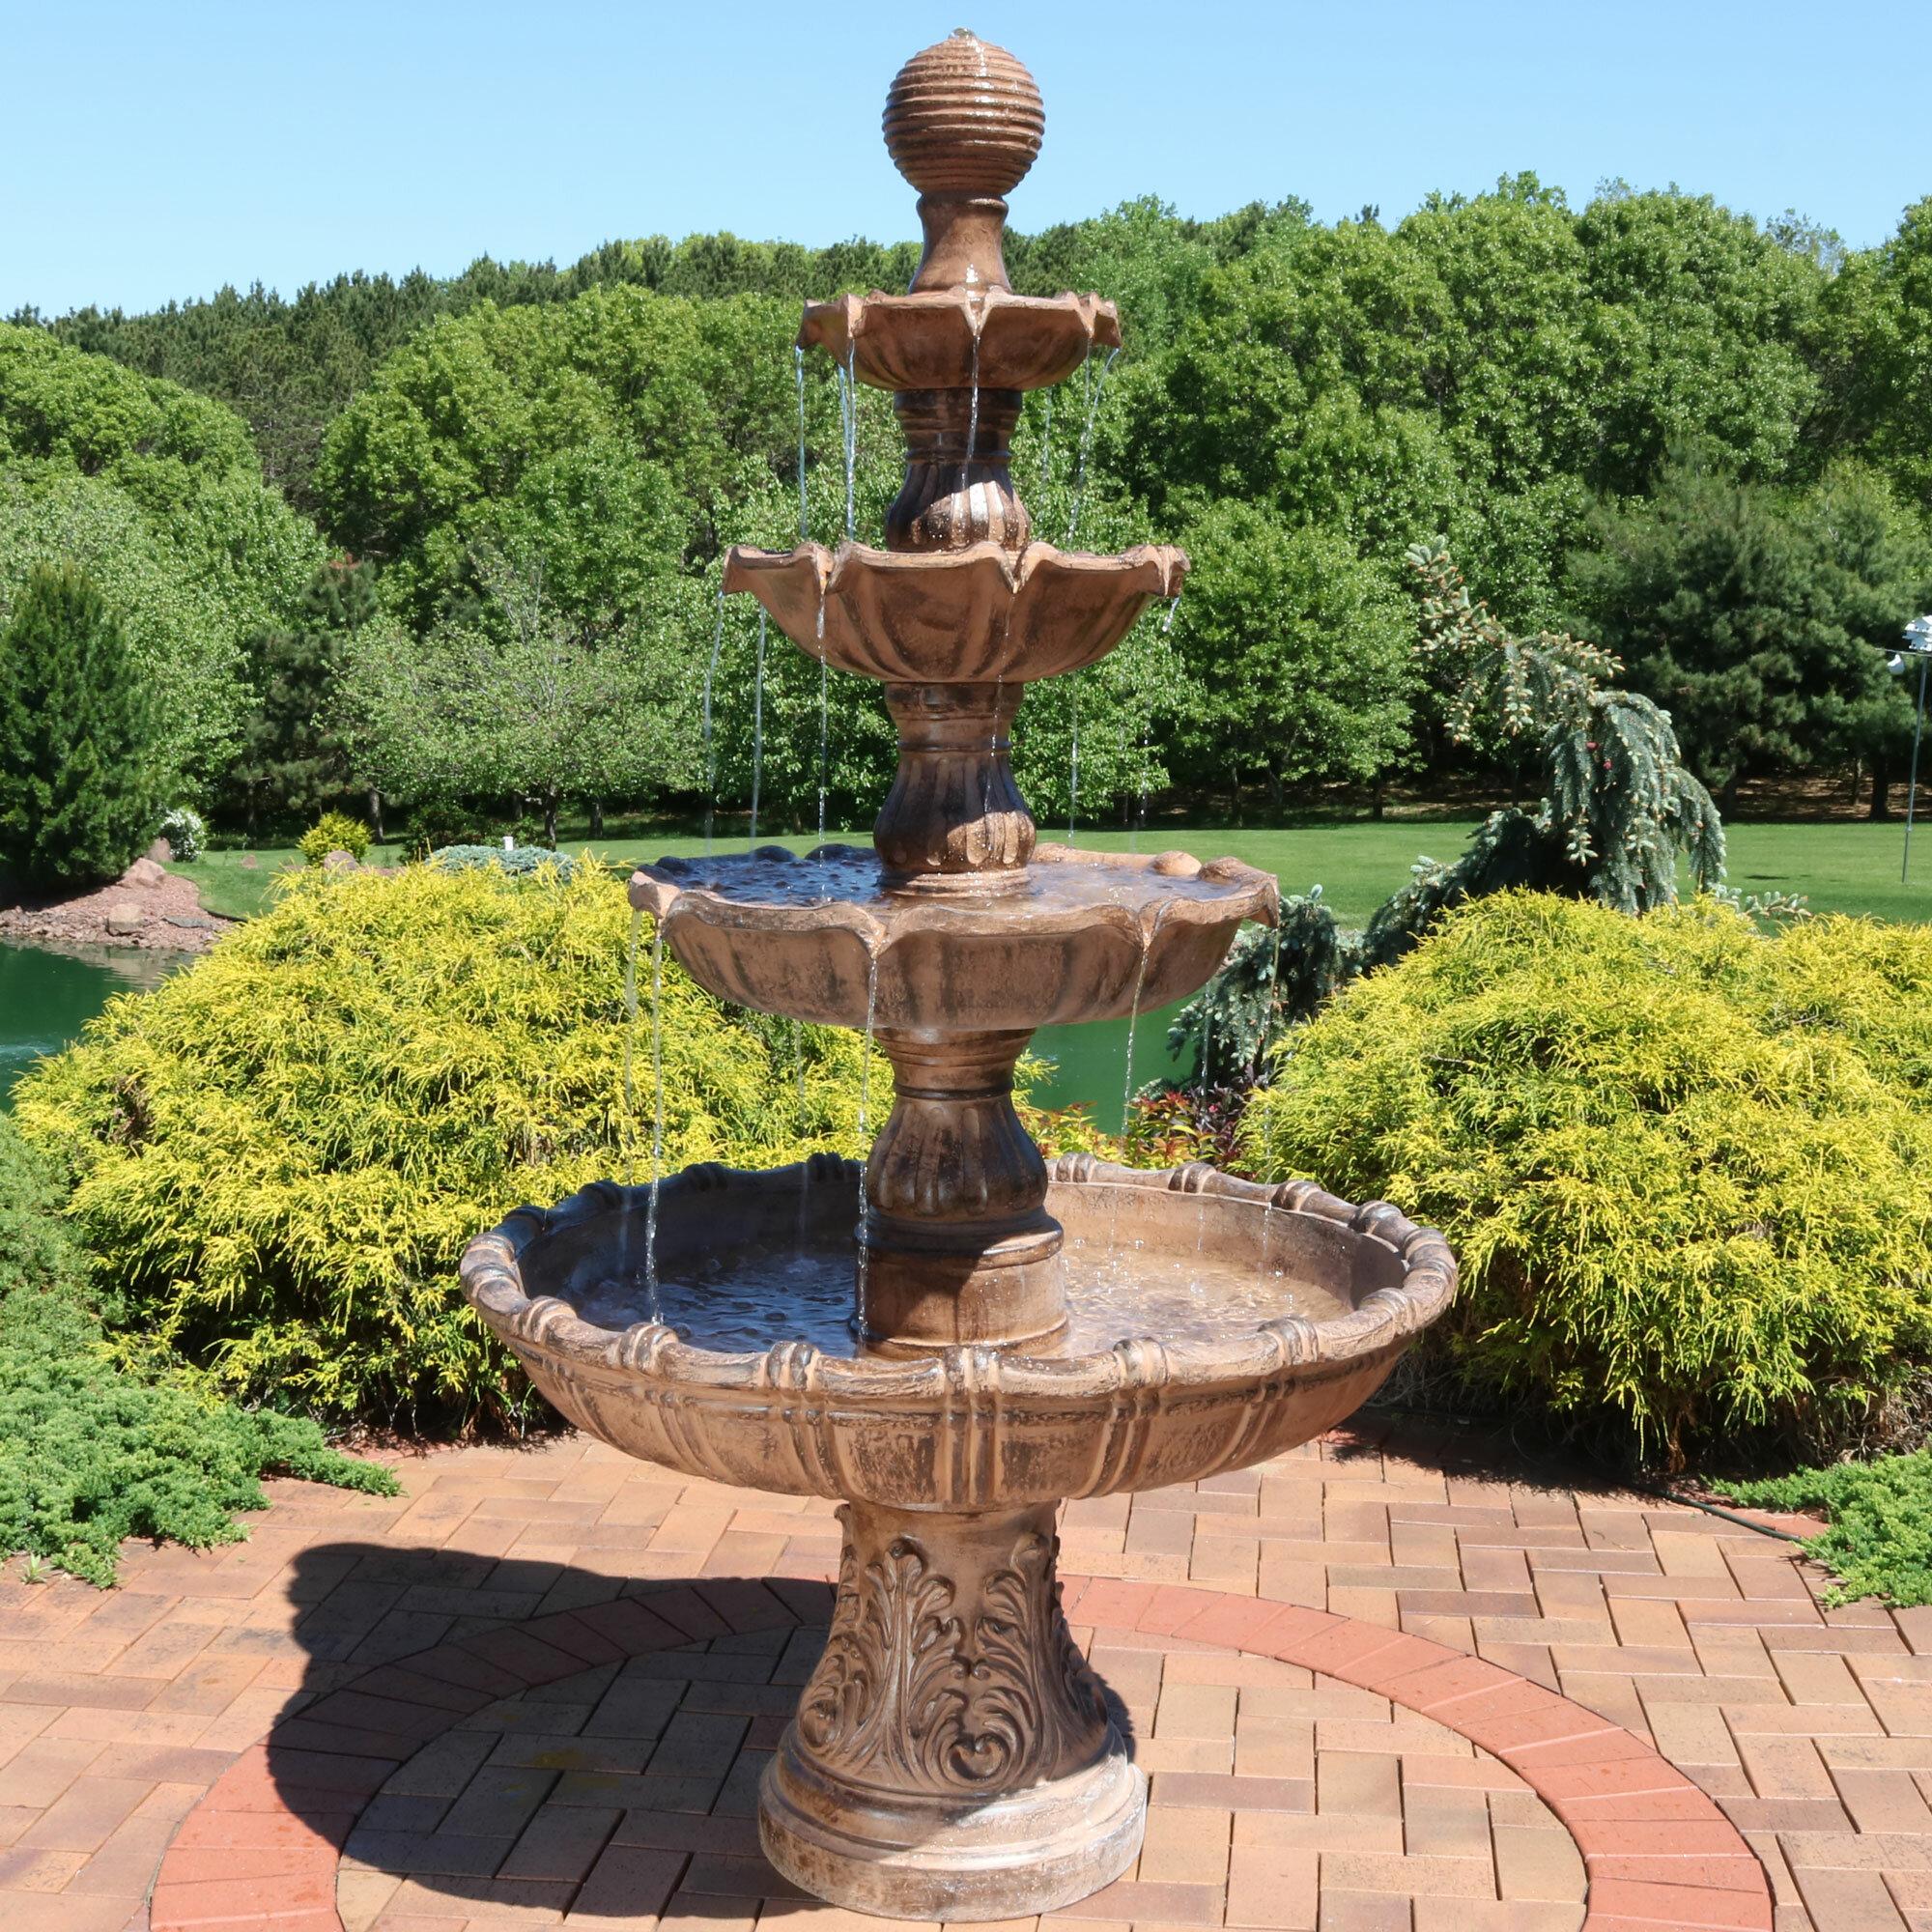 Astoria Grand Dunston Fibergl Resin Large Tiered Ball Outdoor Fountain Reviews Wayfair